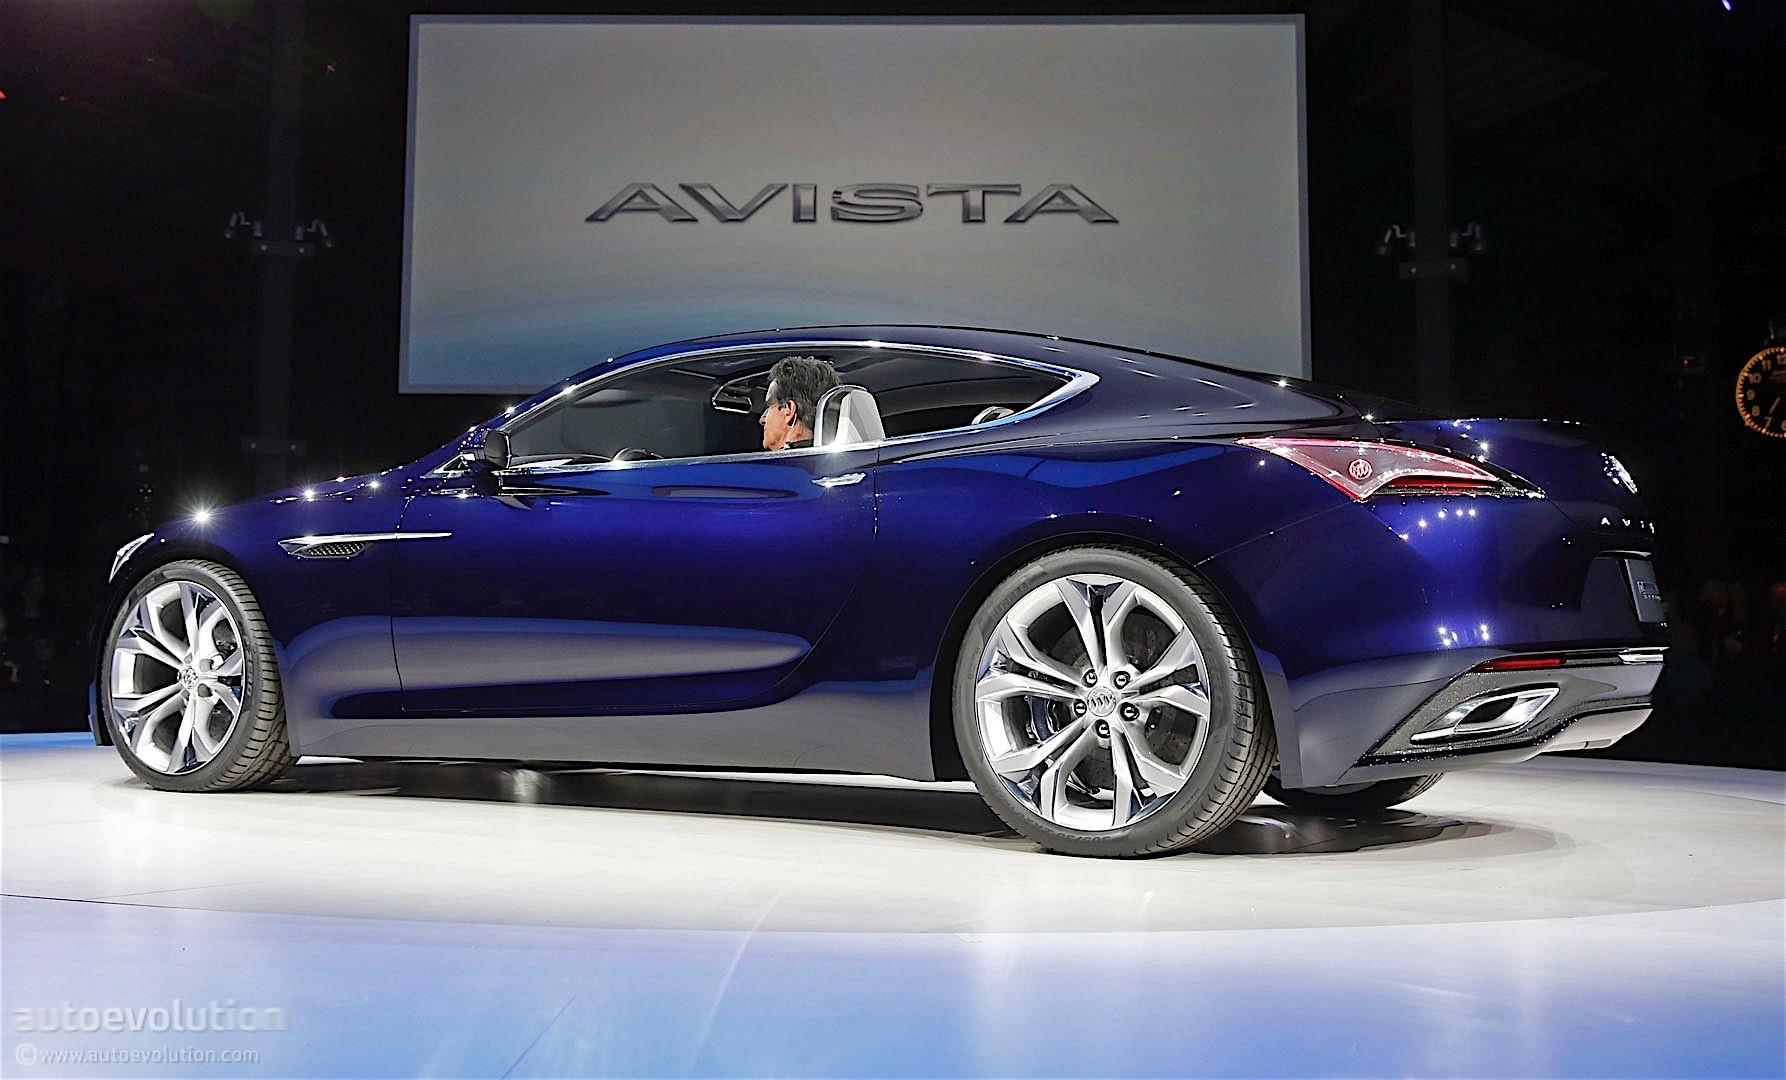 Buick Avista Concept Bows at 2016 Detroit Auto Show - autoevolution